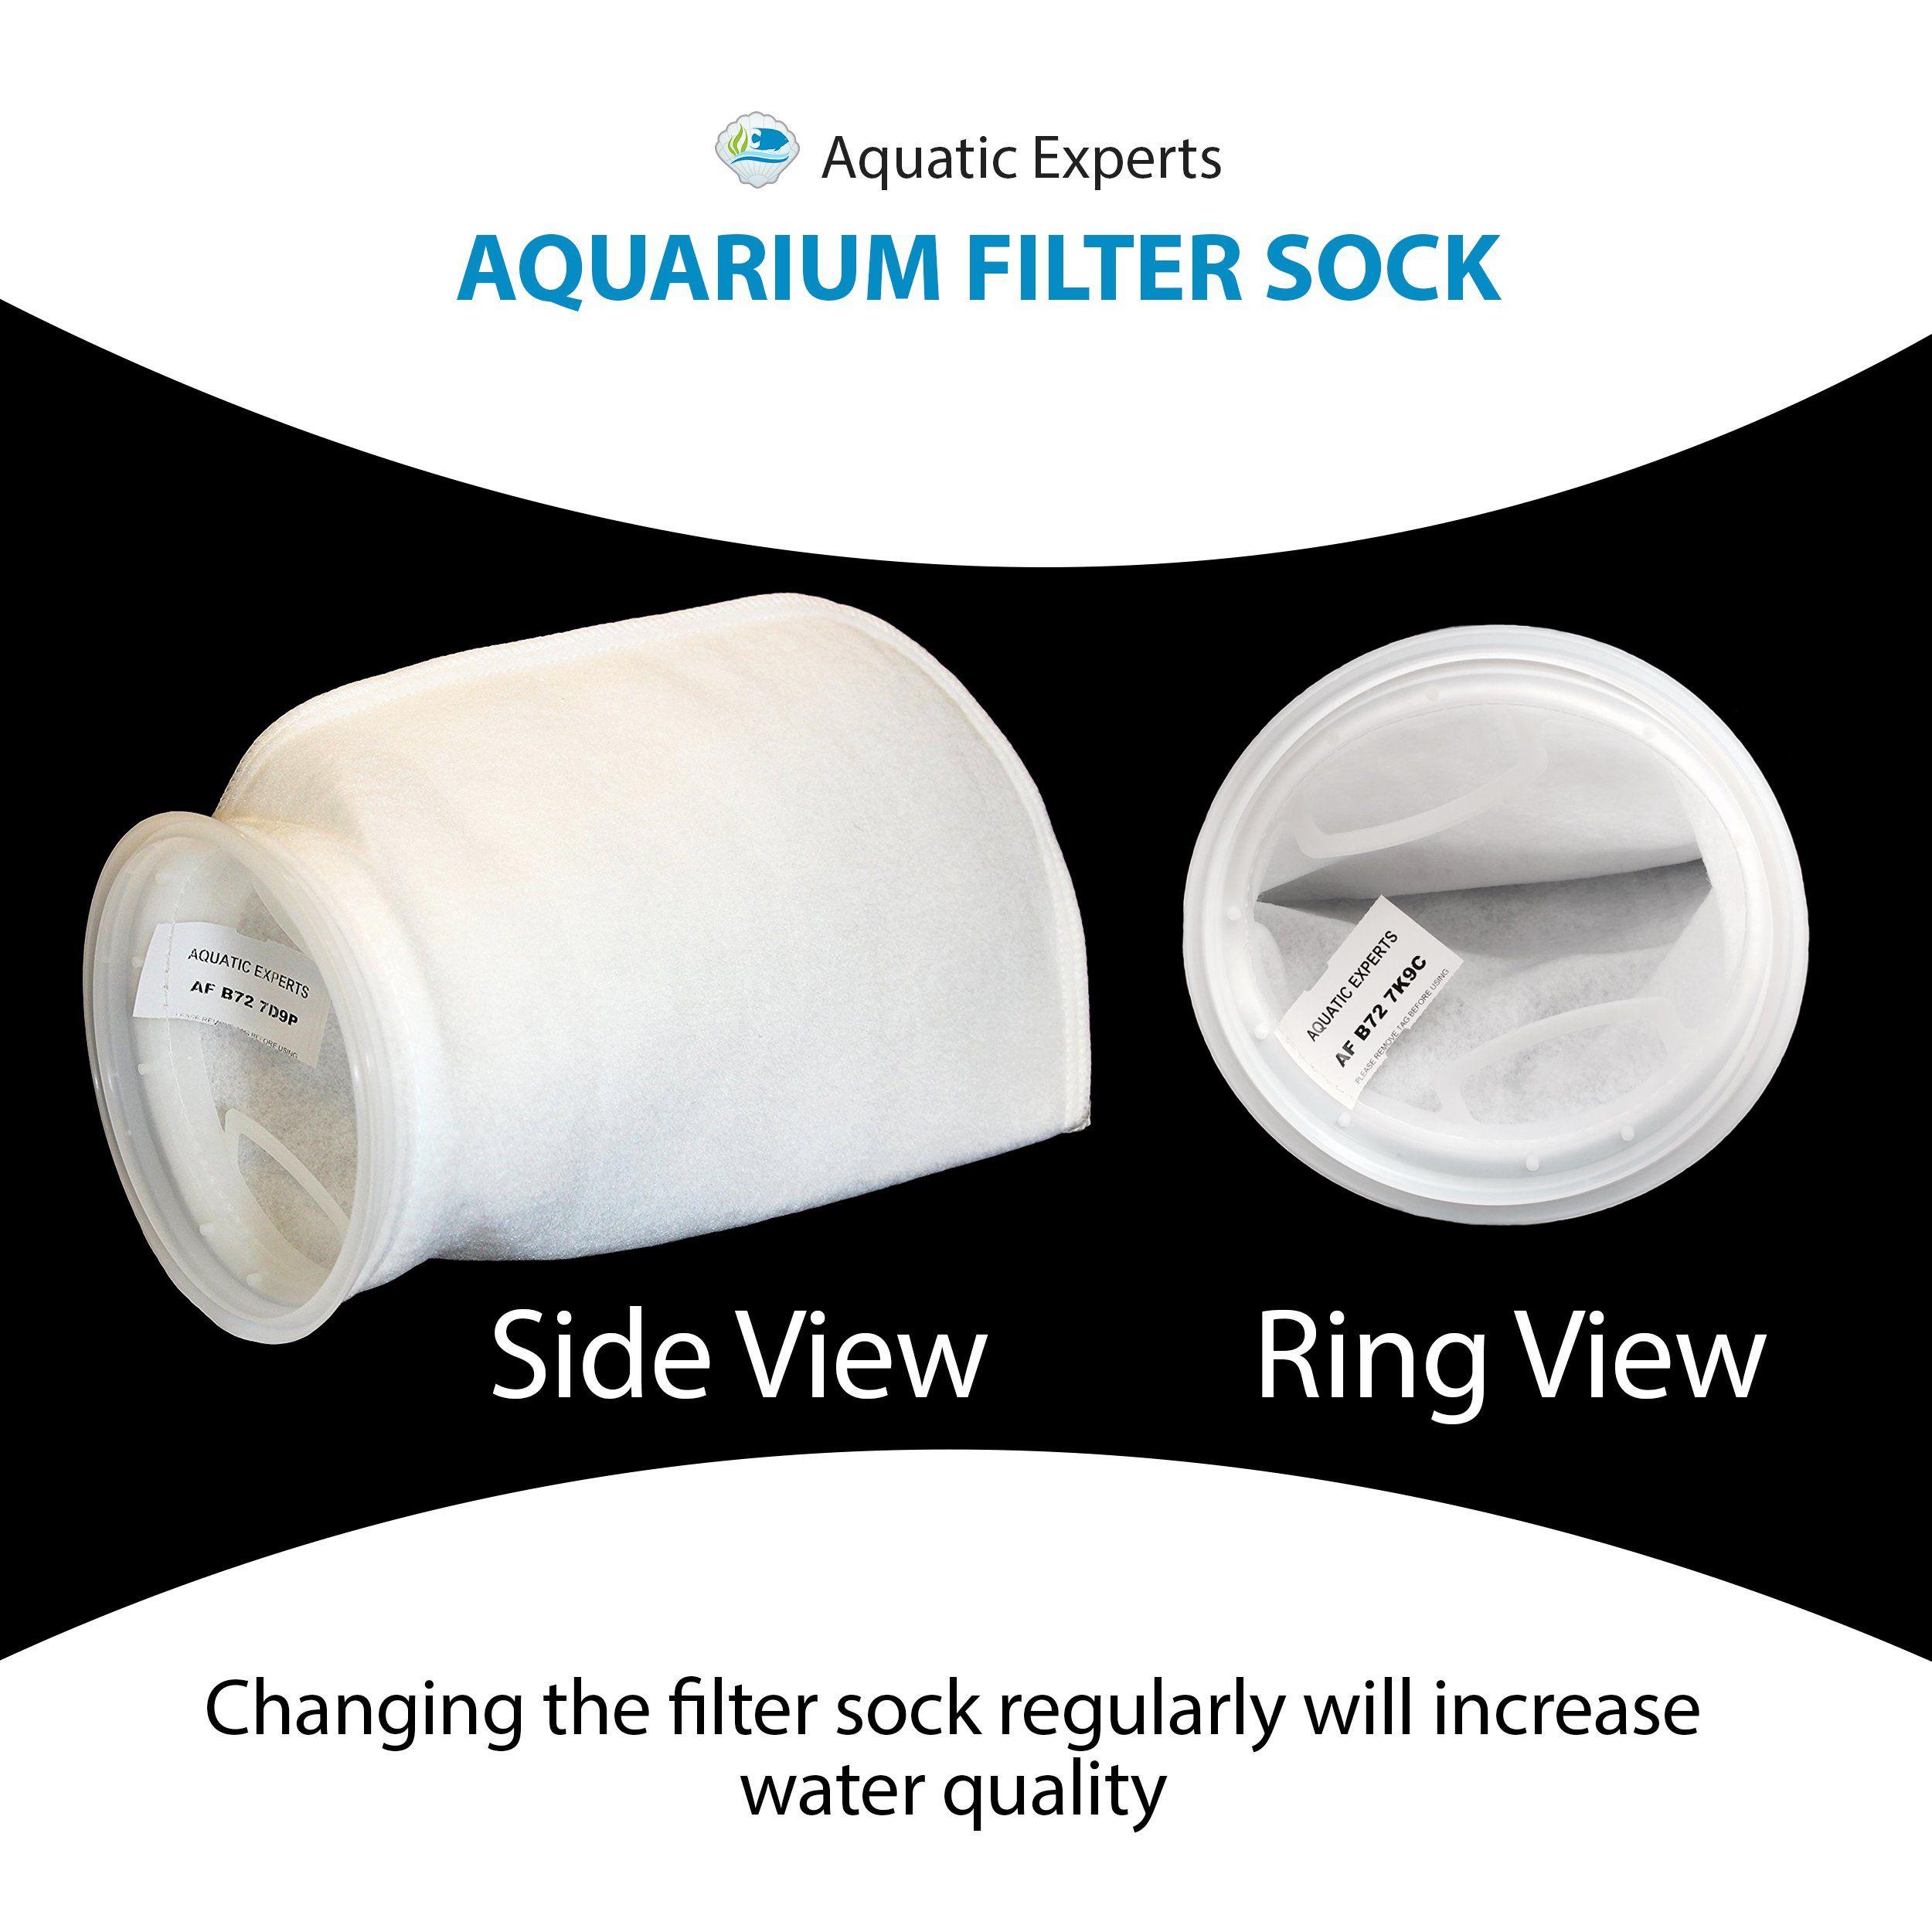 068c2b3fe1d5 7 Inch Filter Socks 200 Micron 7 Inch Ring by 16 Inch Long Filter Socks  LONG Premium Aquarium Felt Filter Bags Custom Made In The USA For Aquatic  Experts 2 ...